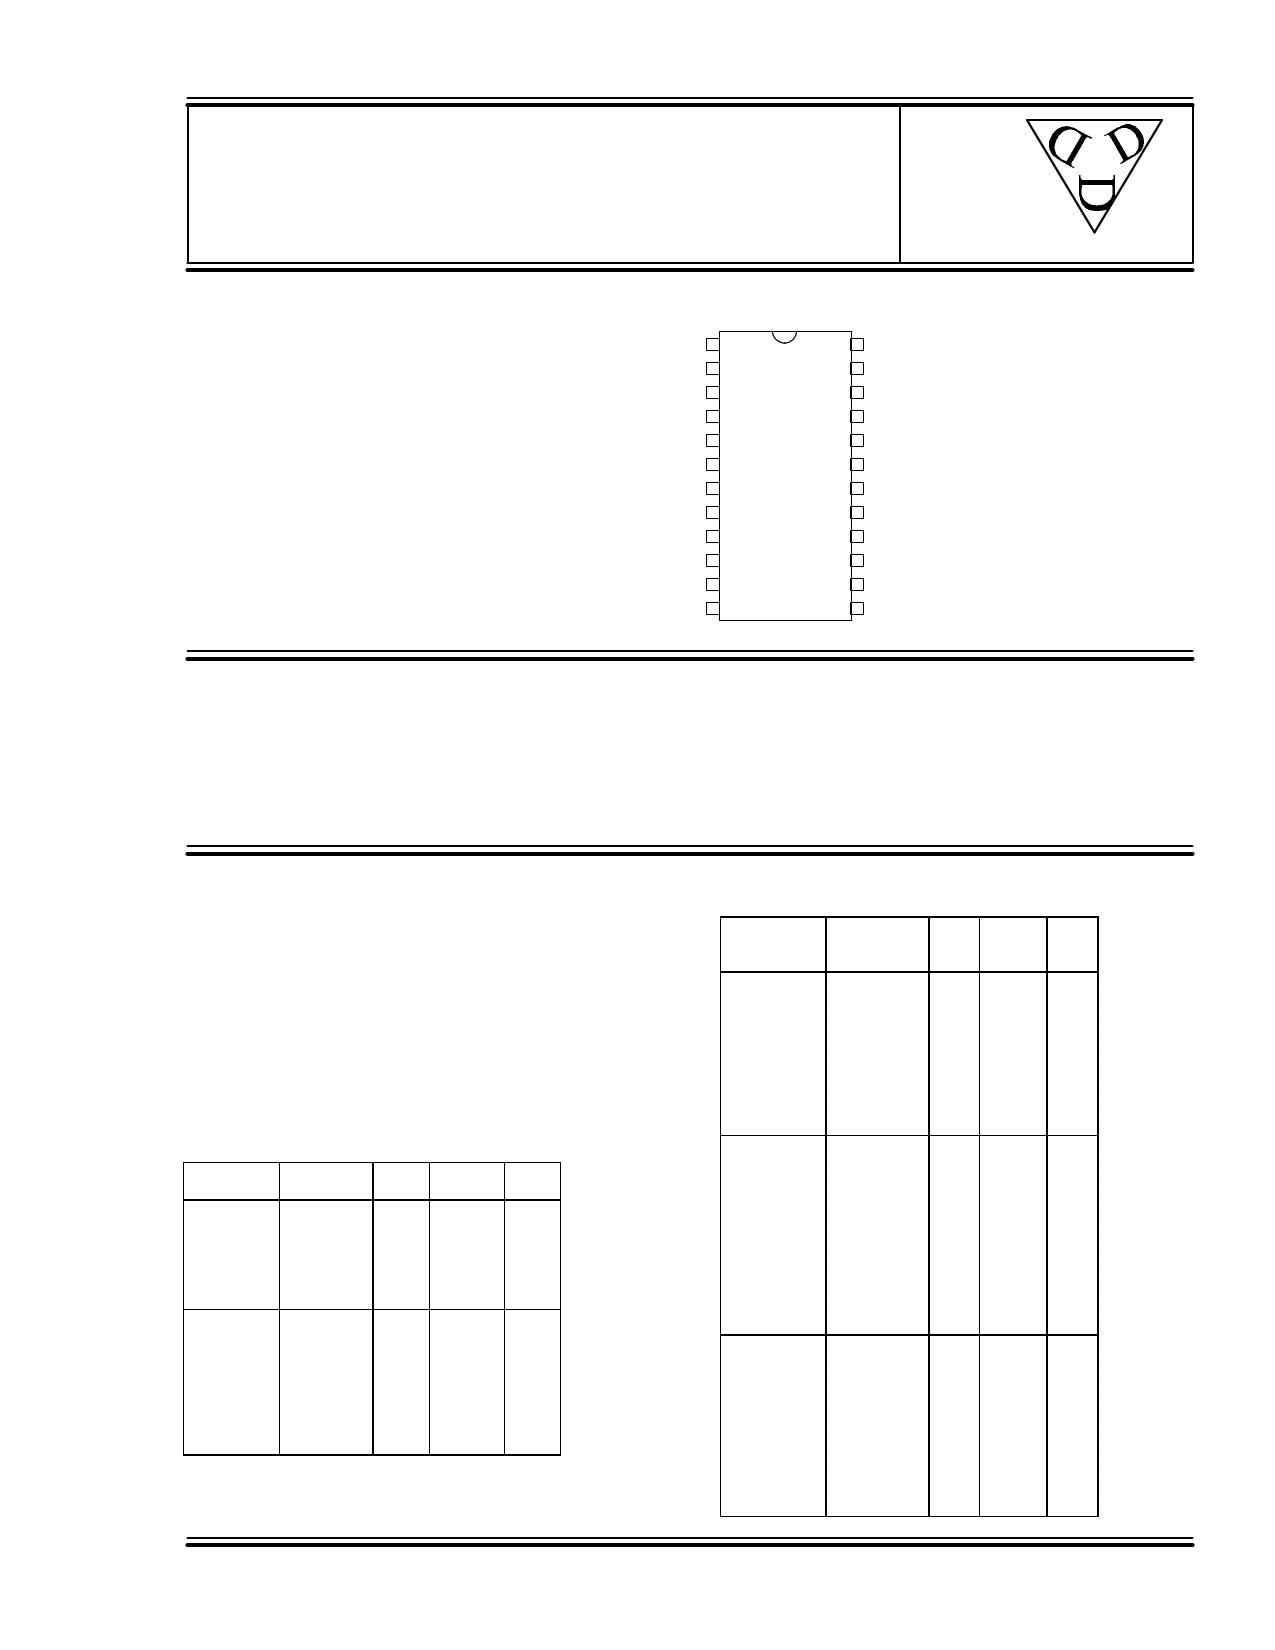 2211-80C Datasheet, 2211-80C PDF,ピン配置, 機能